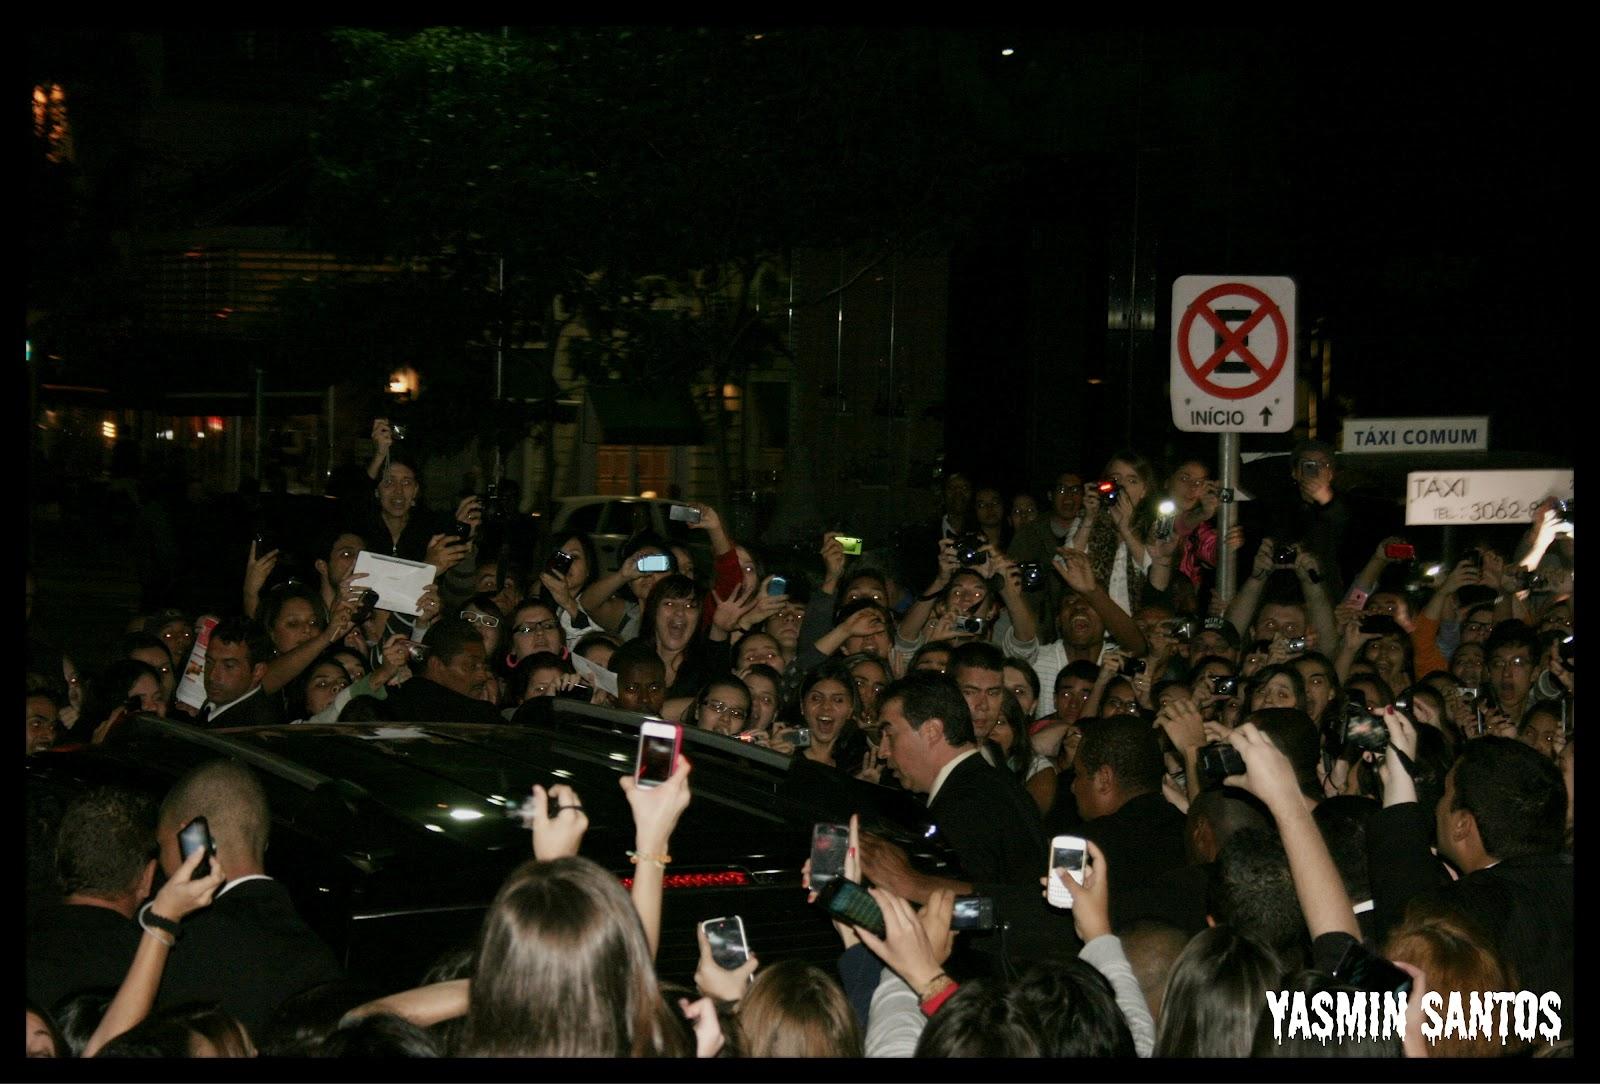 http://1.bp.blogspot.com/-WiVZ1gGVaco/T8jtT4JnMkI/AAAAAAAABL0/Mu6TLR_Lw_s/s1600/Ian+no+Brasil+2.jpg